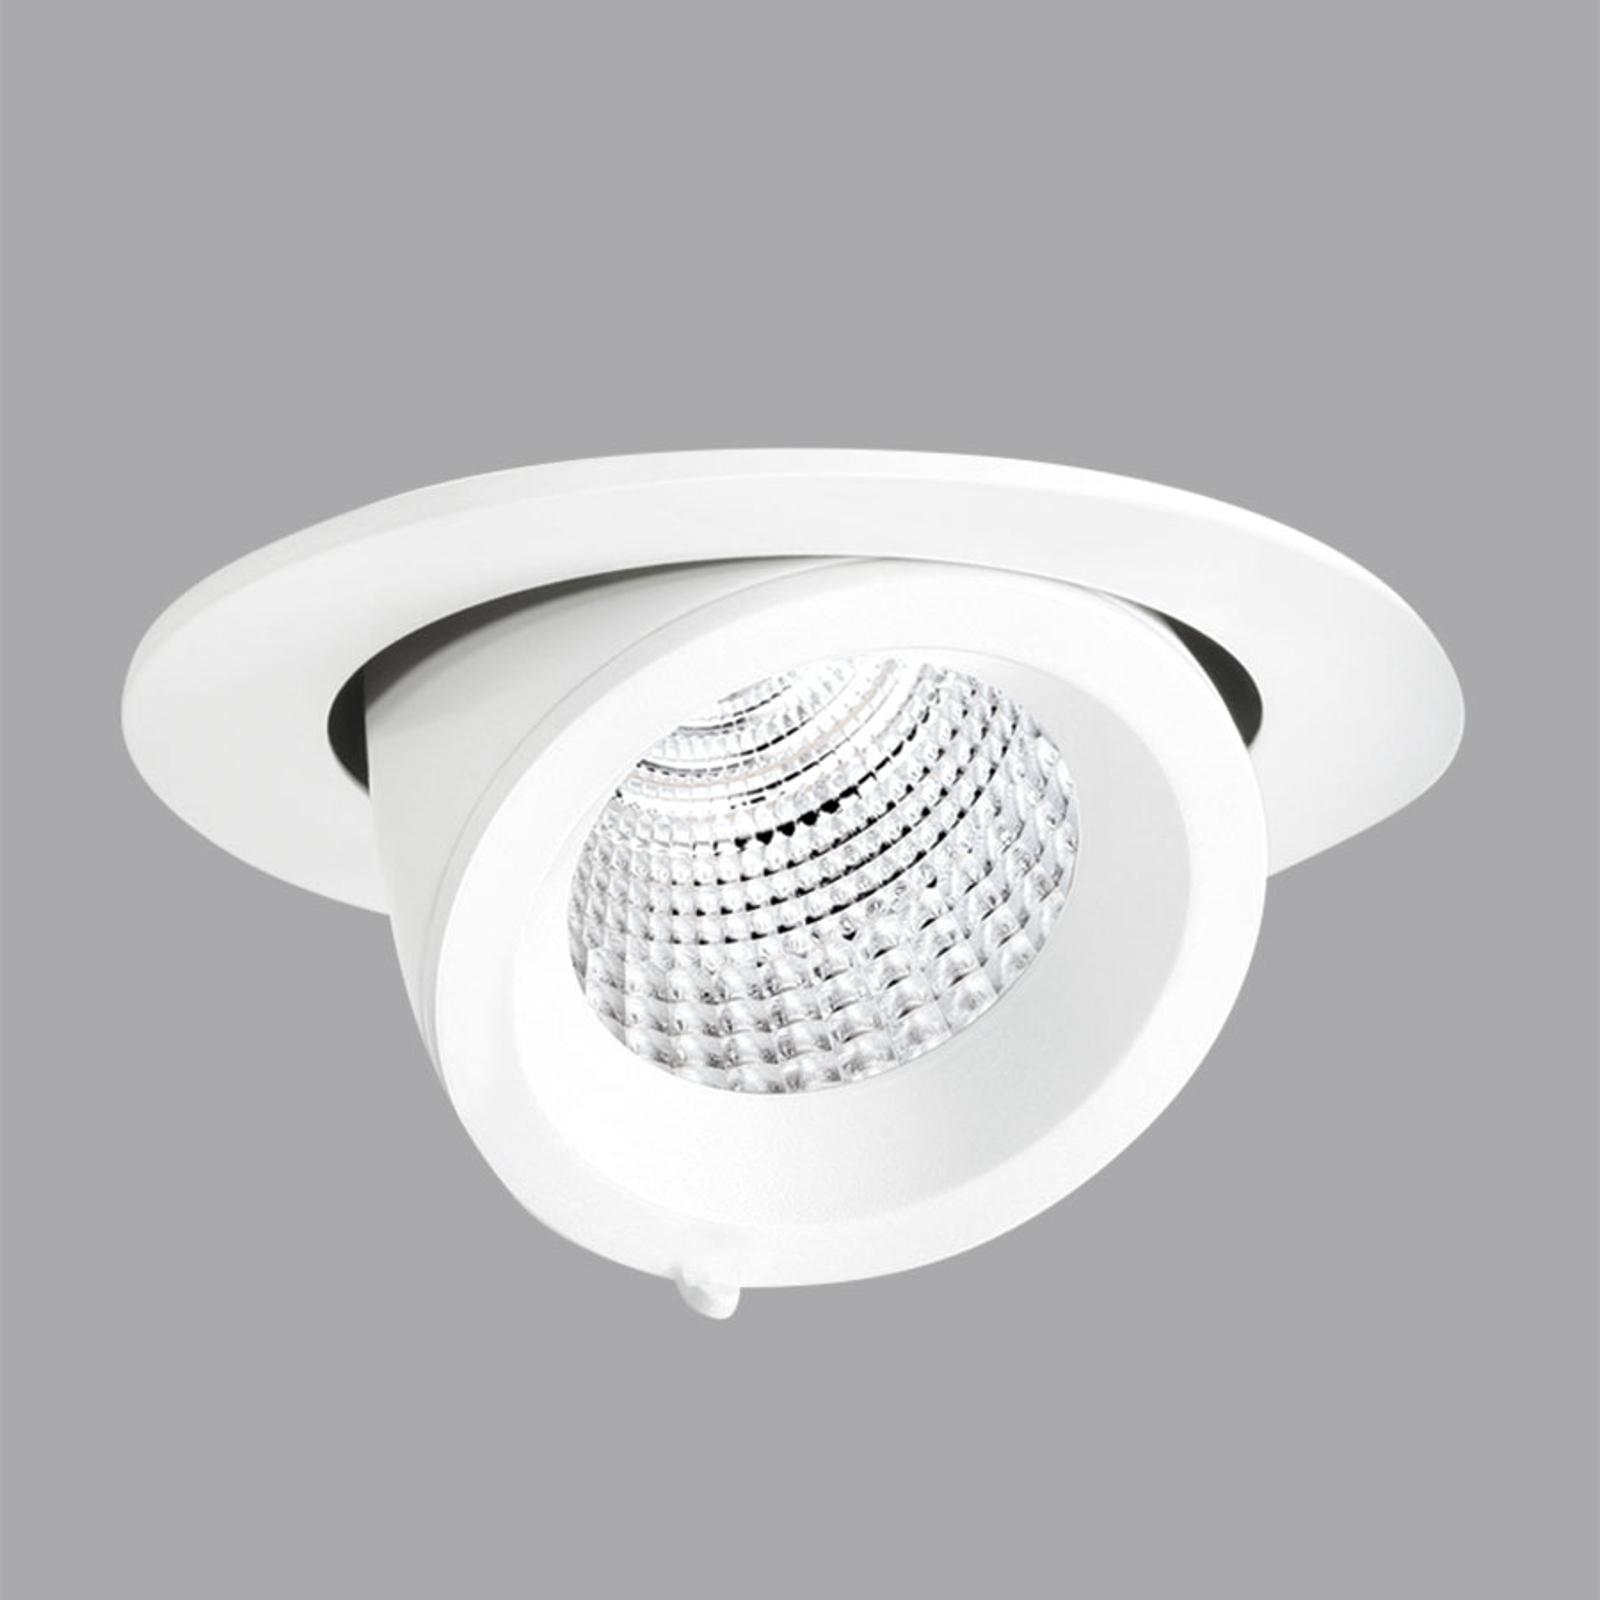 Inbouwlamp EB431 LED spot reflectorlamp wit 3.000K